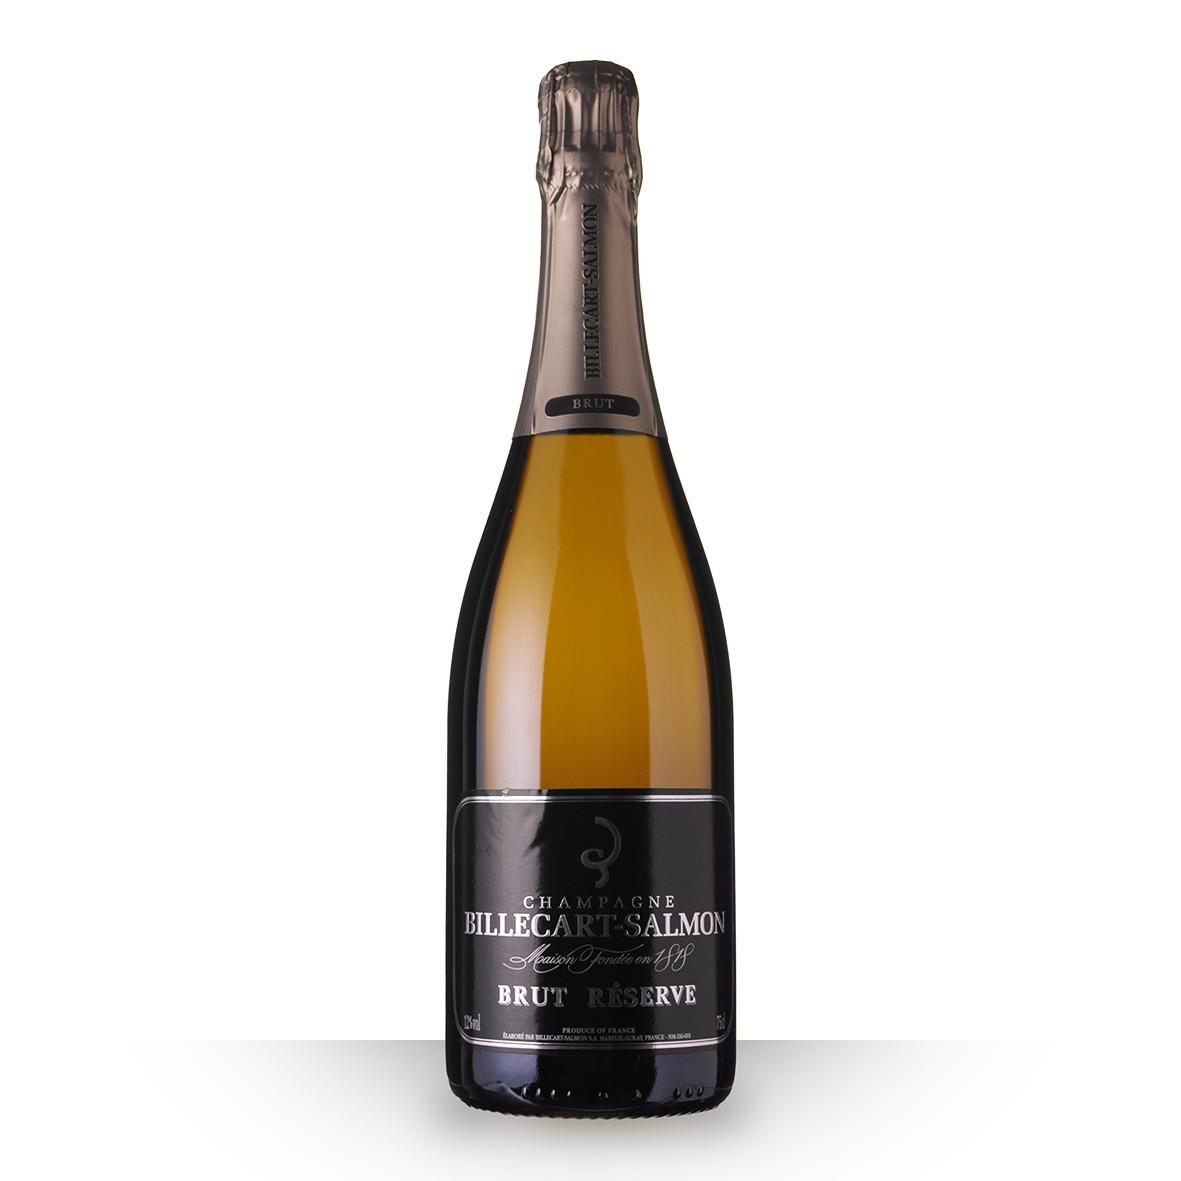 Champagne Billecart-Salmon Brut Réserve 75cl www.odyssee-vins.com